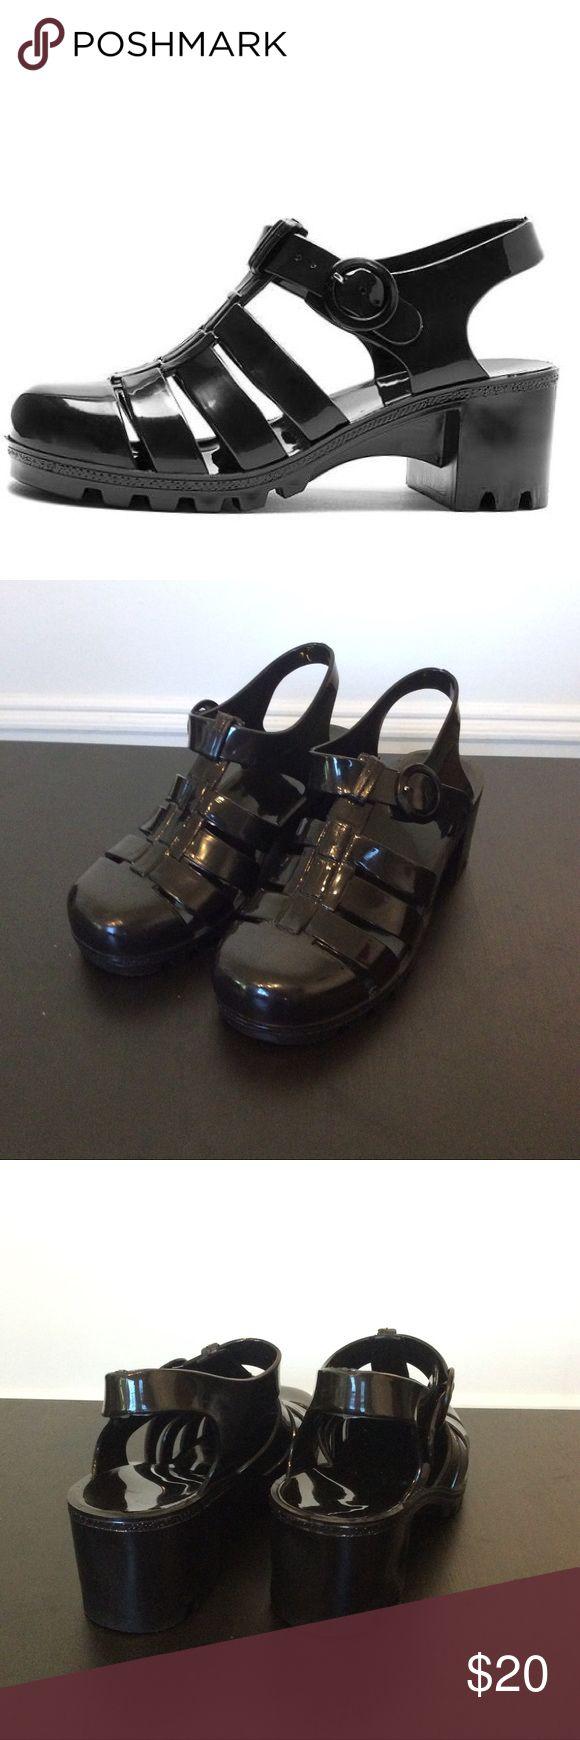 Black jelly sandals american apparel - American Apparel Juju Jellies American Apparel Juju Jellies In Black Size 6 Super Comfy